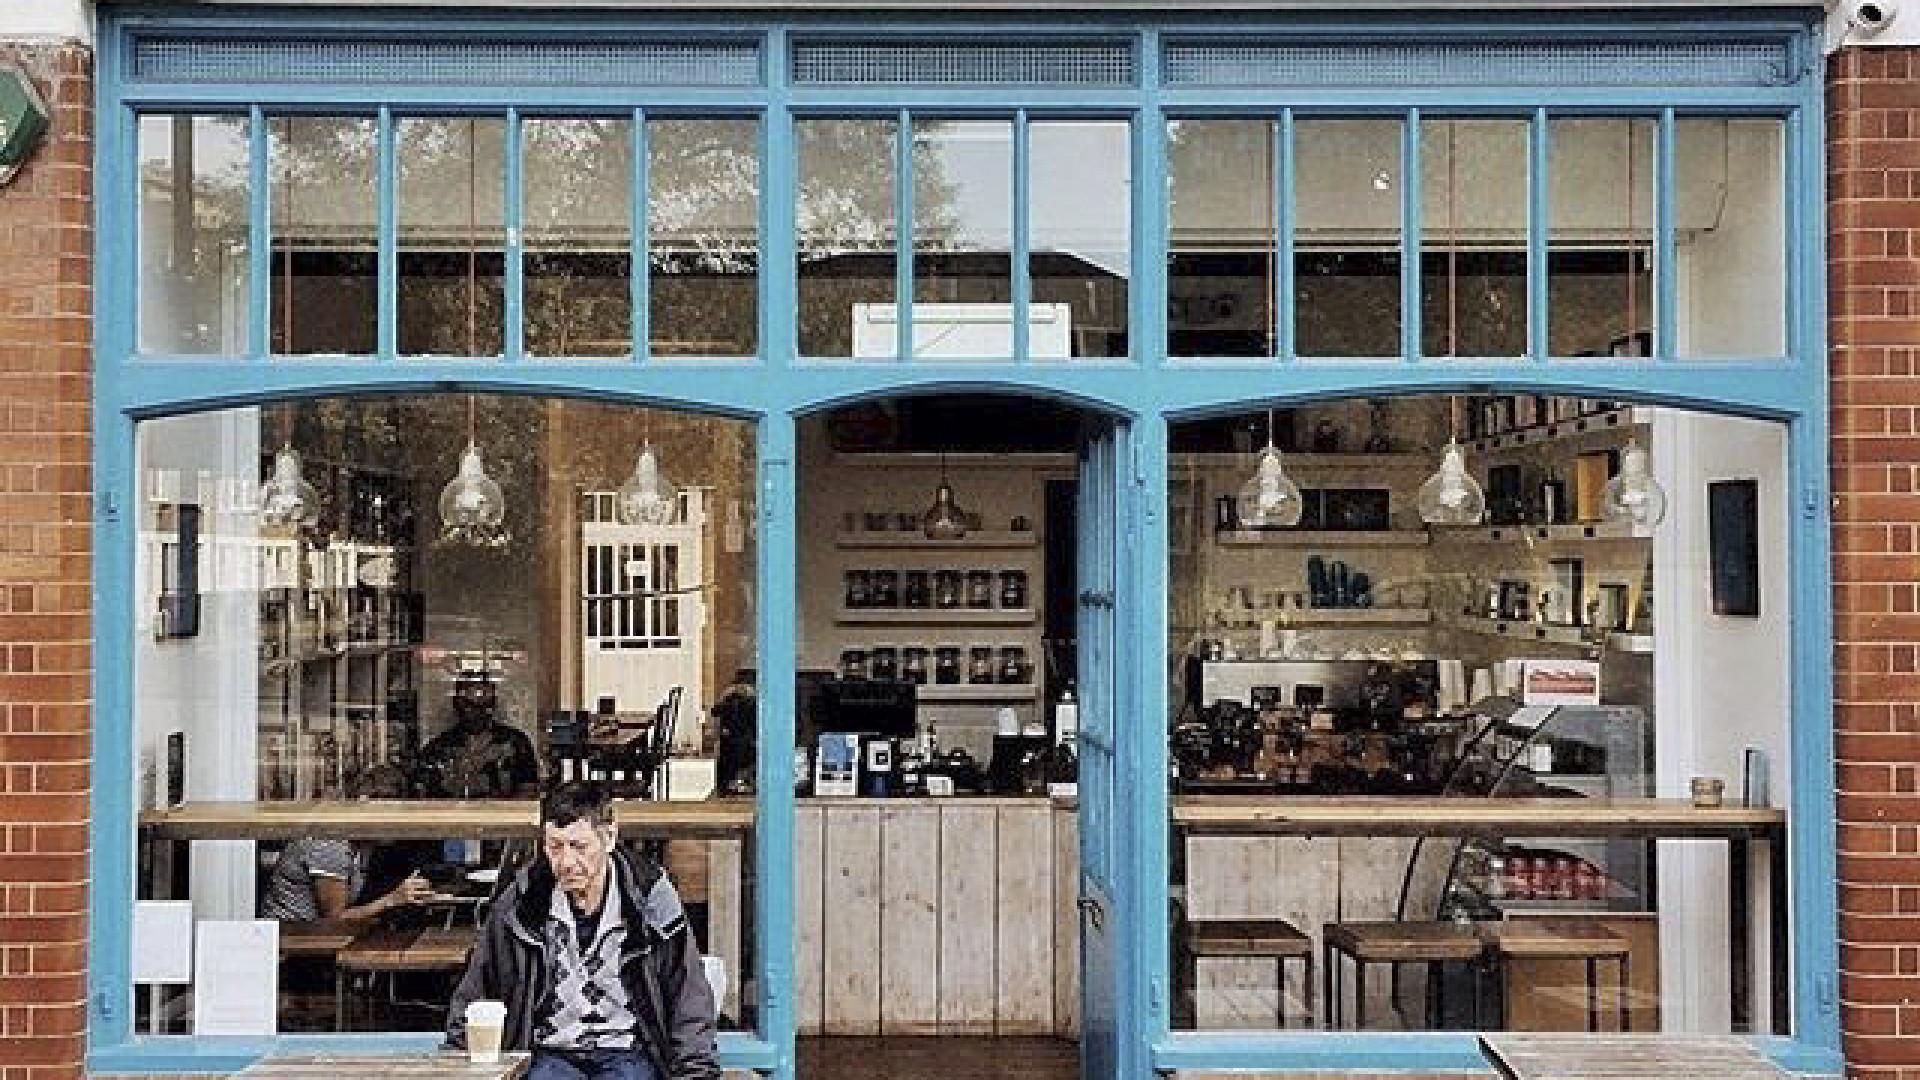 Paper & Cup exterior